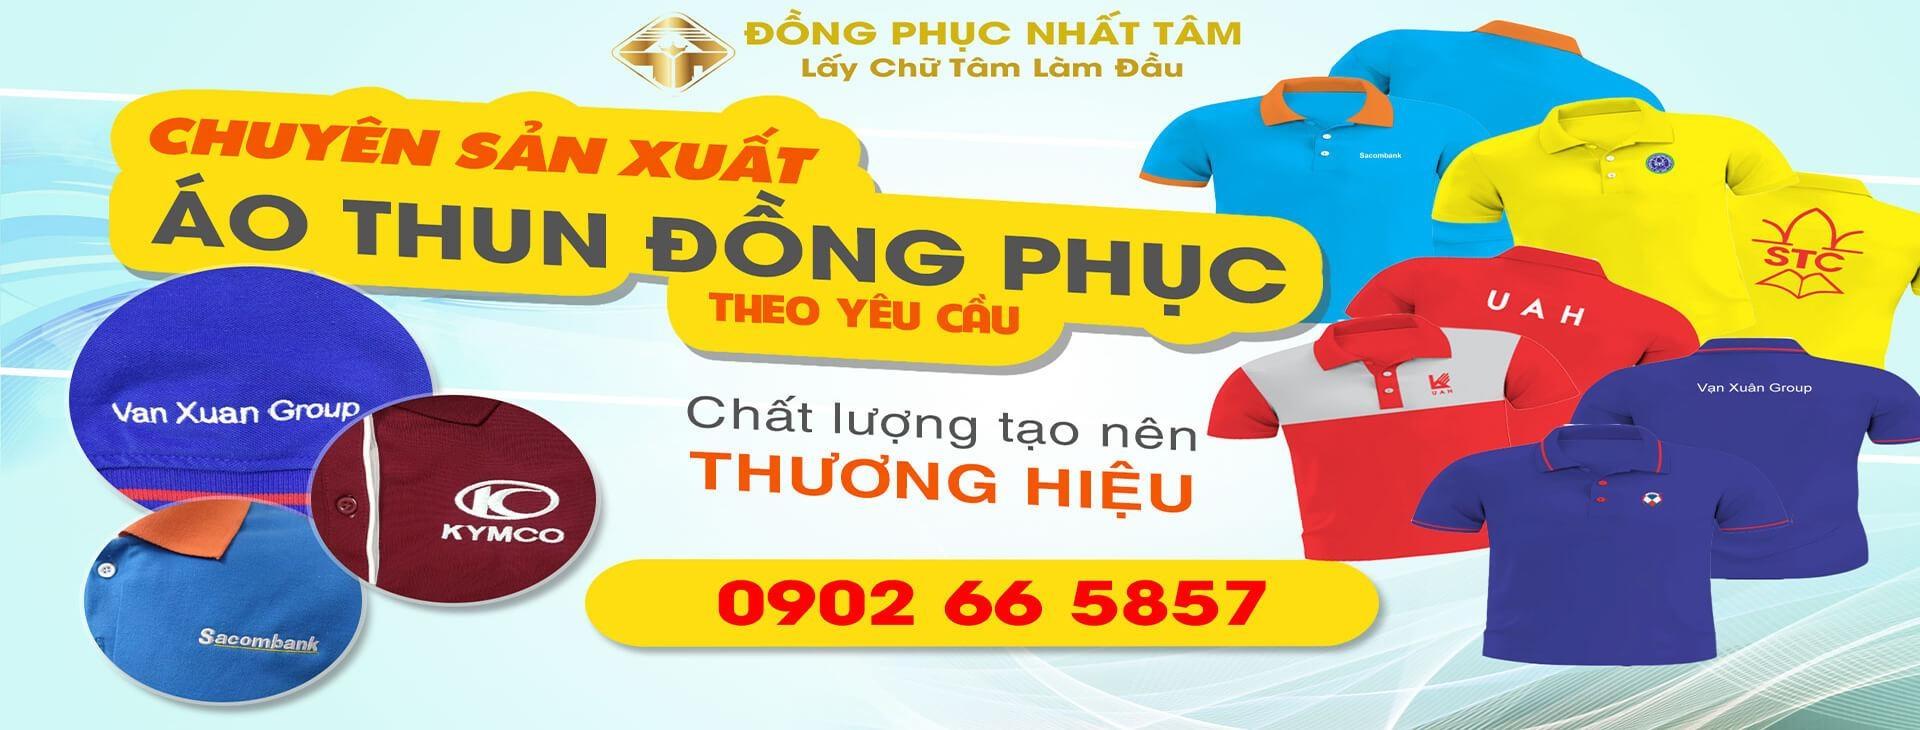 Đồng Phục Nhất Tâm (@dongphucnhattam33e) Cover Image